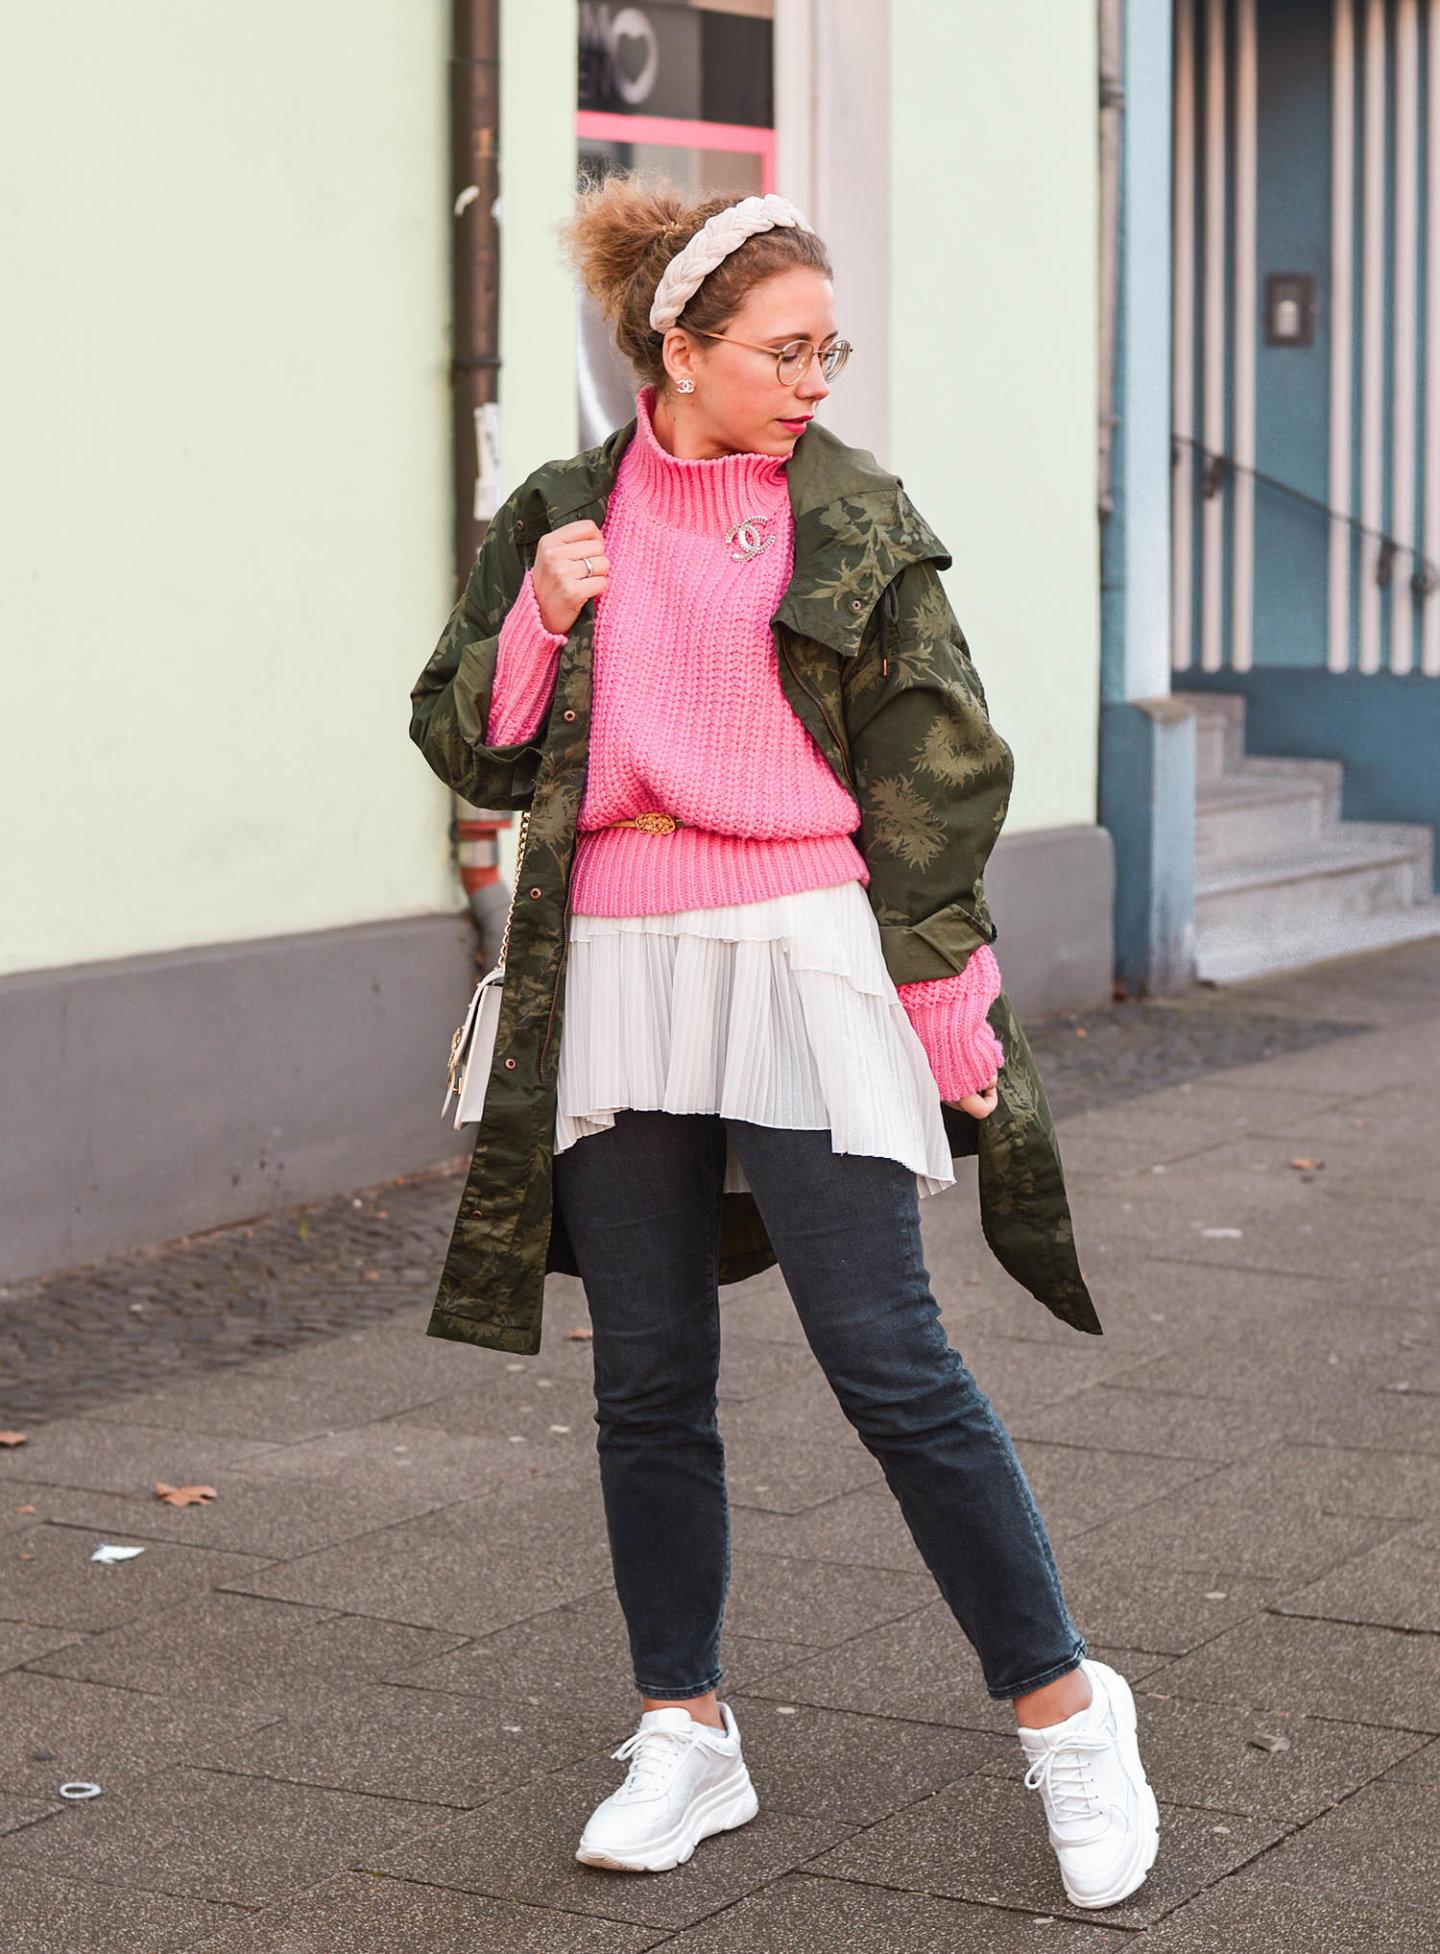 Farbkombi khaki meets pink